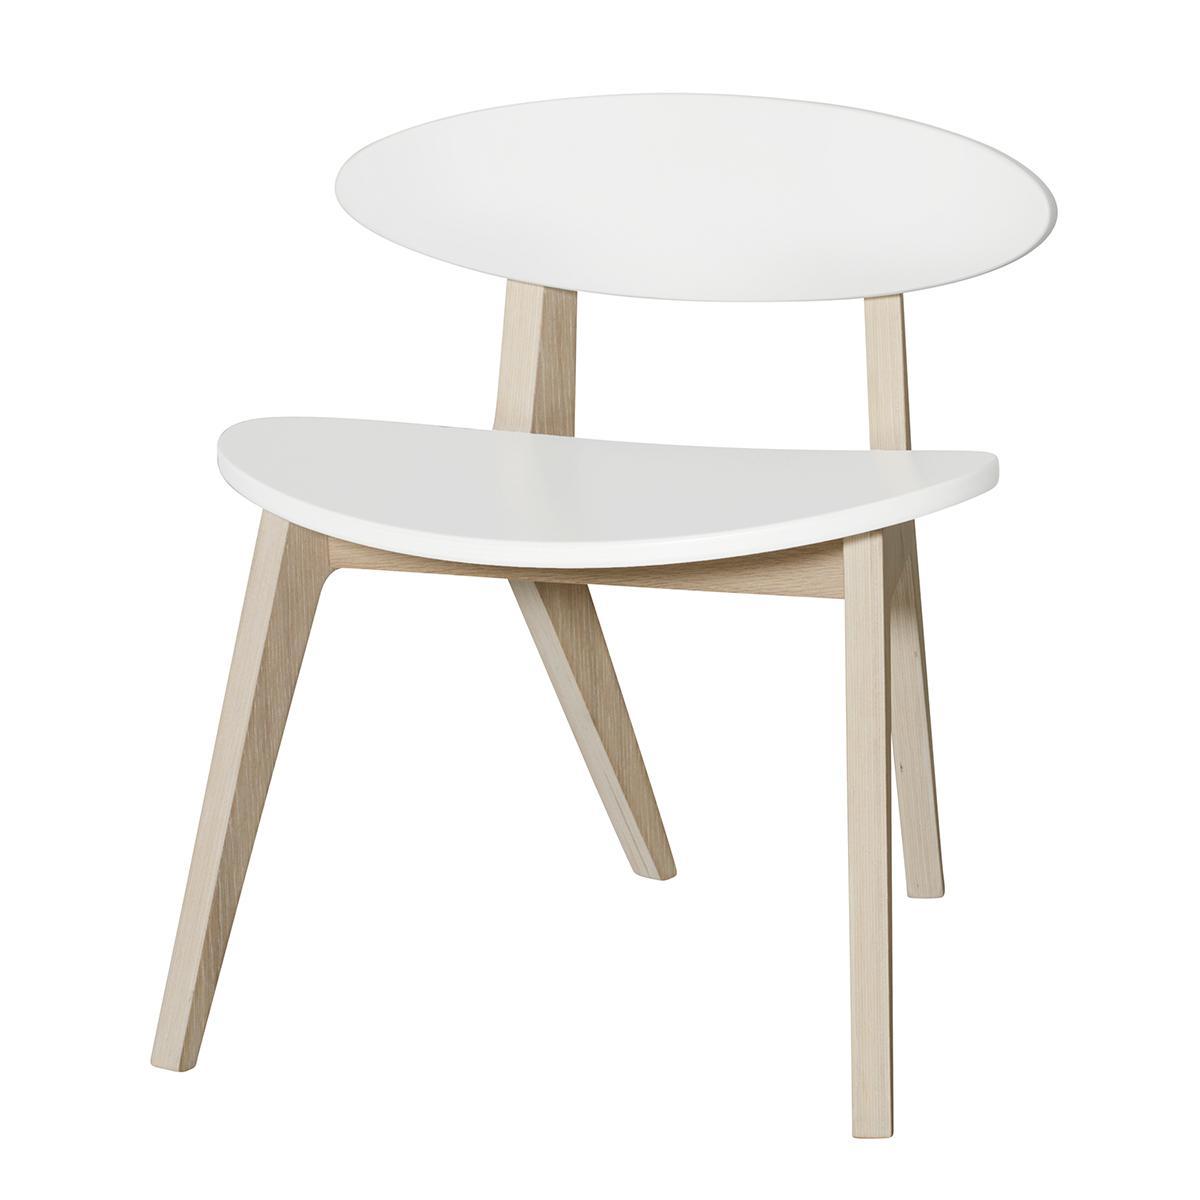 Chaise PingPong WOOD Oliver Furniture blanc-chêne